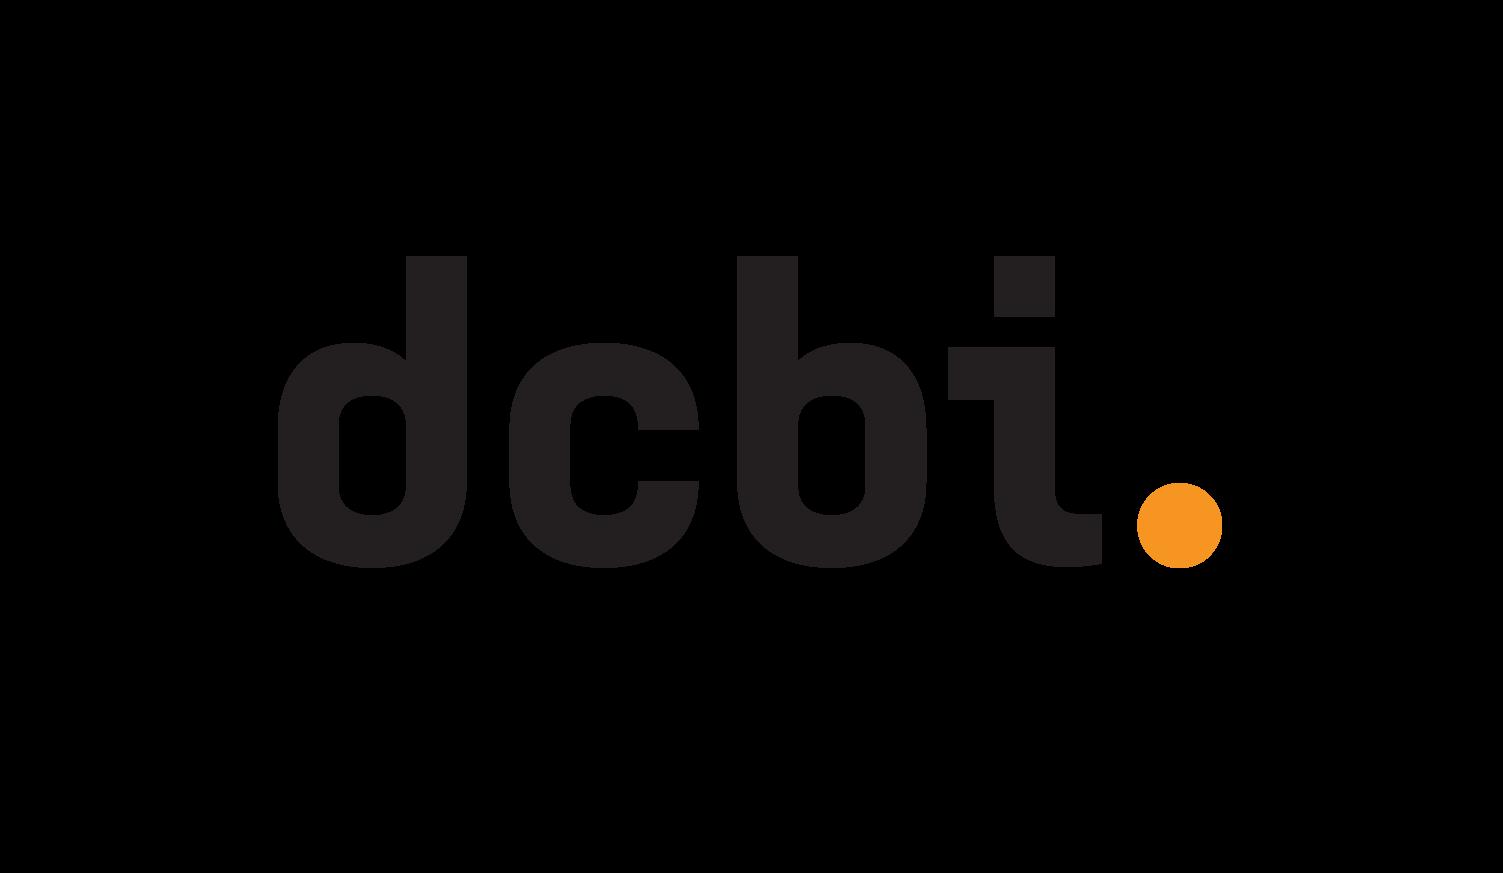 logo_digital_bodka_d